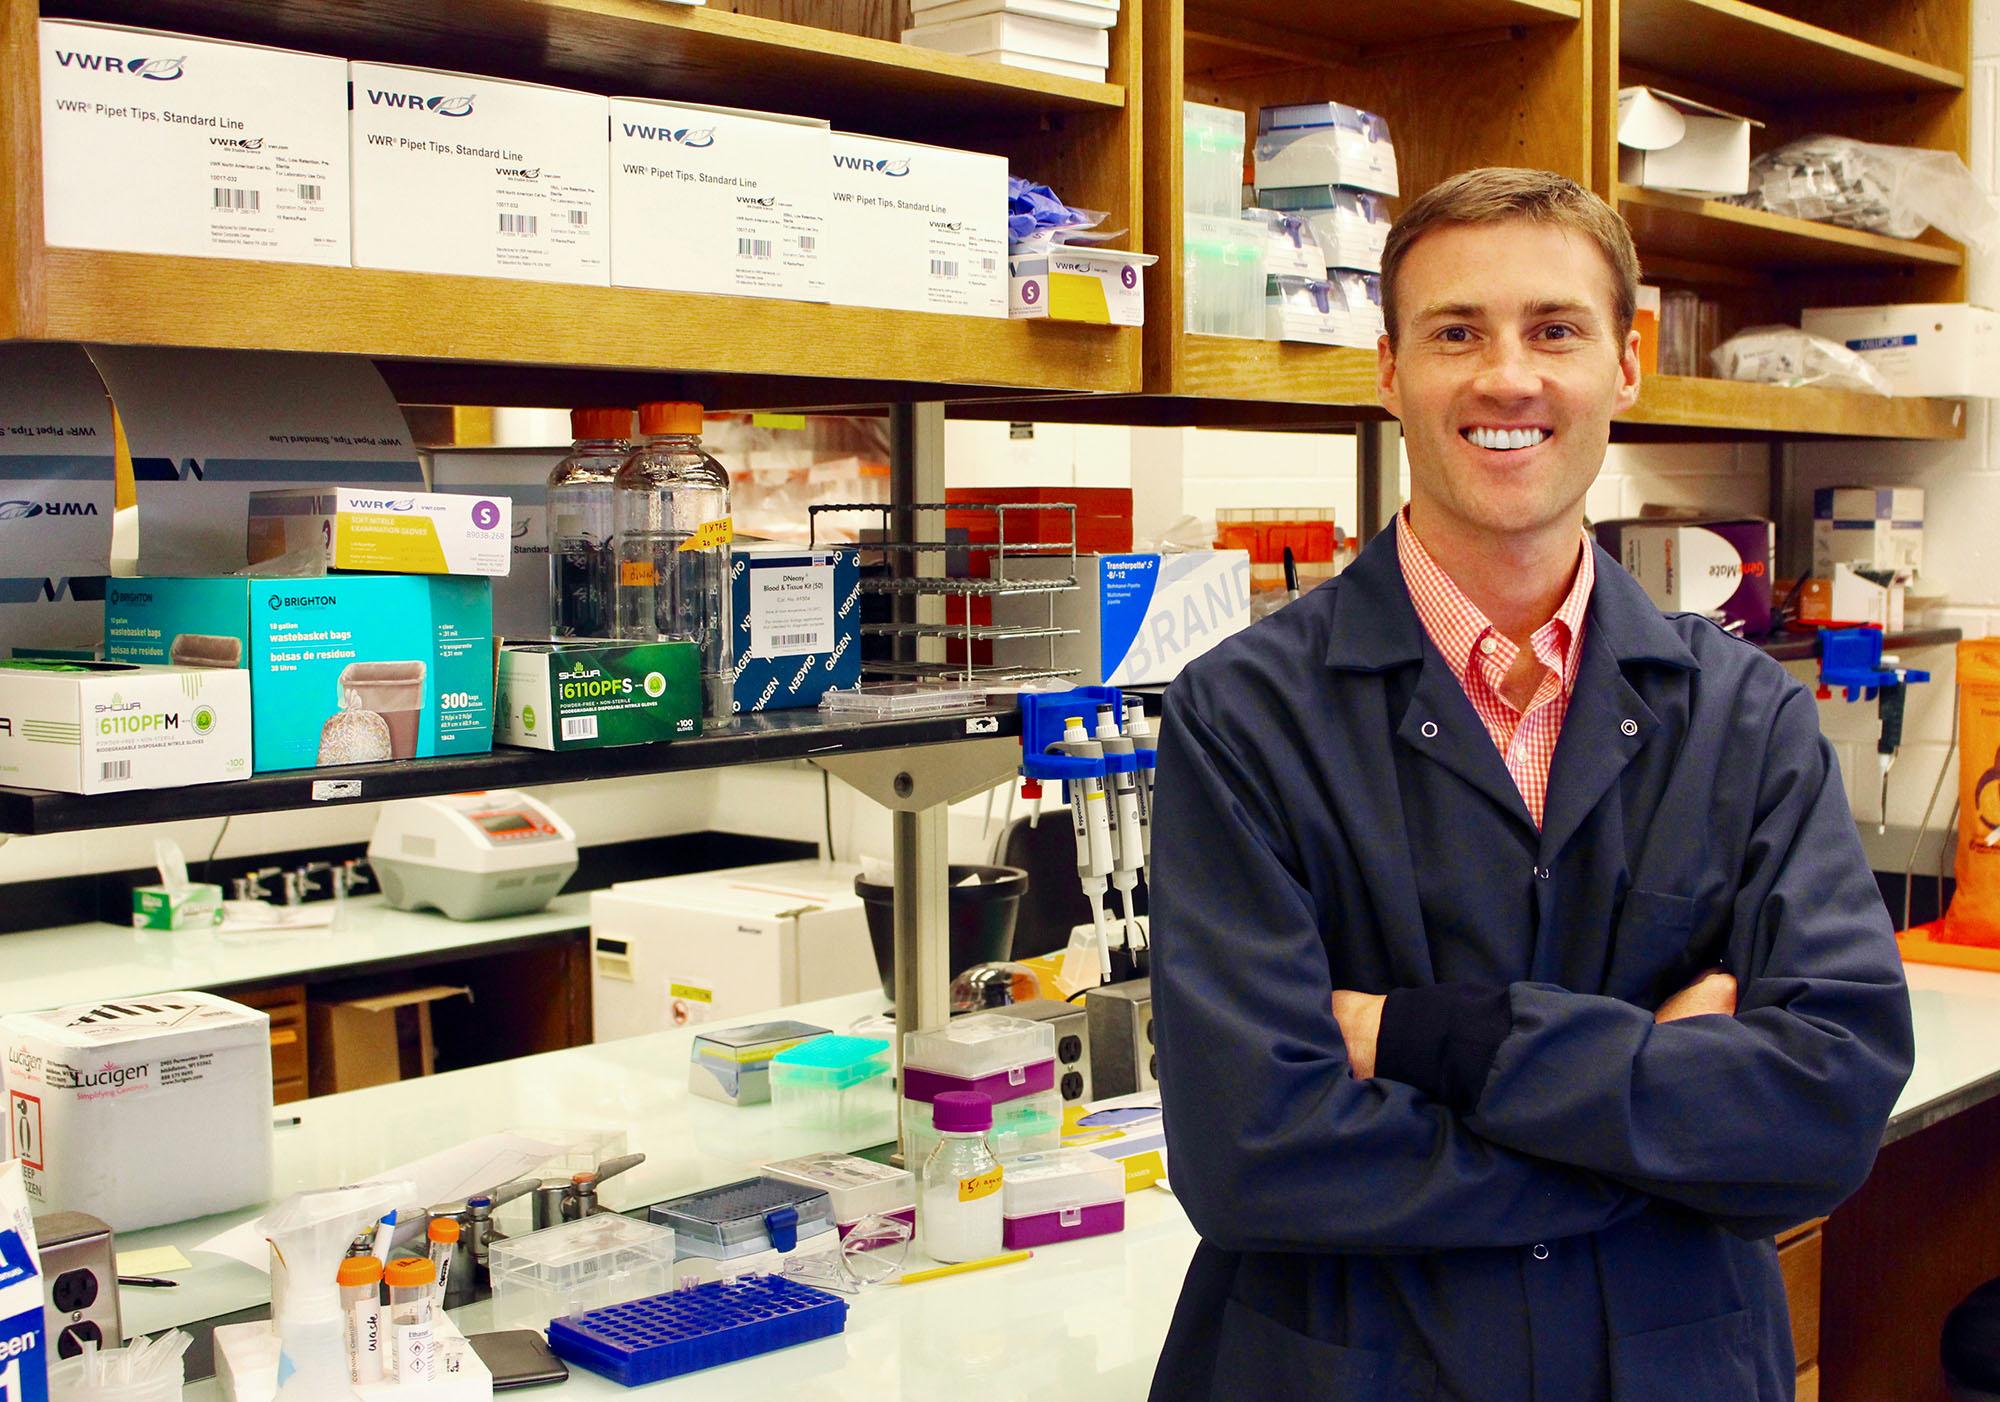 Arthritis and Aging Research | Brian Diekman, PhD